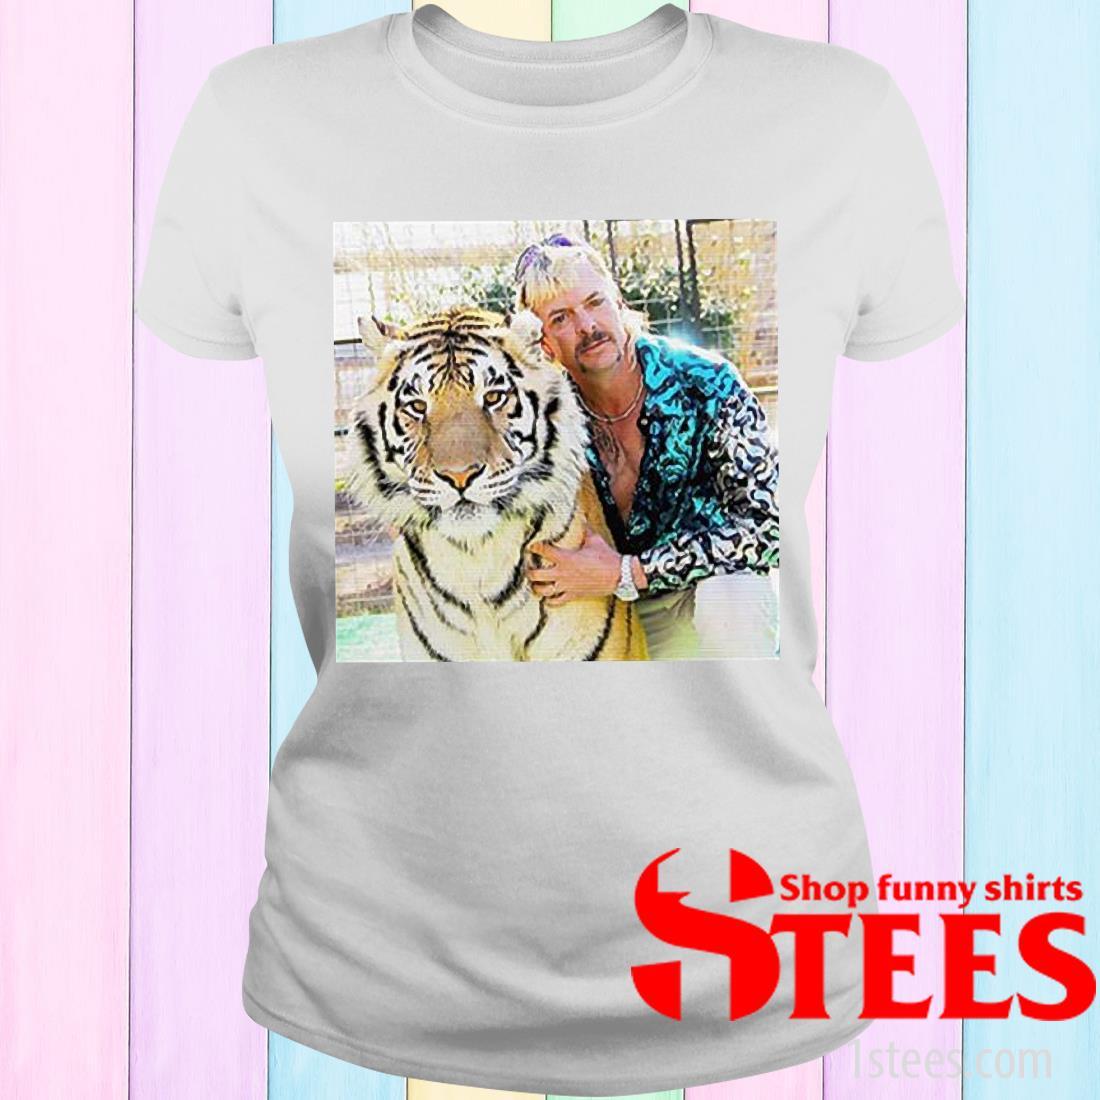 Joe Exotic Tiger King Funny Women's T-Shirt